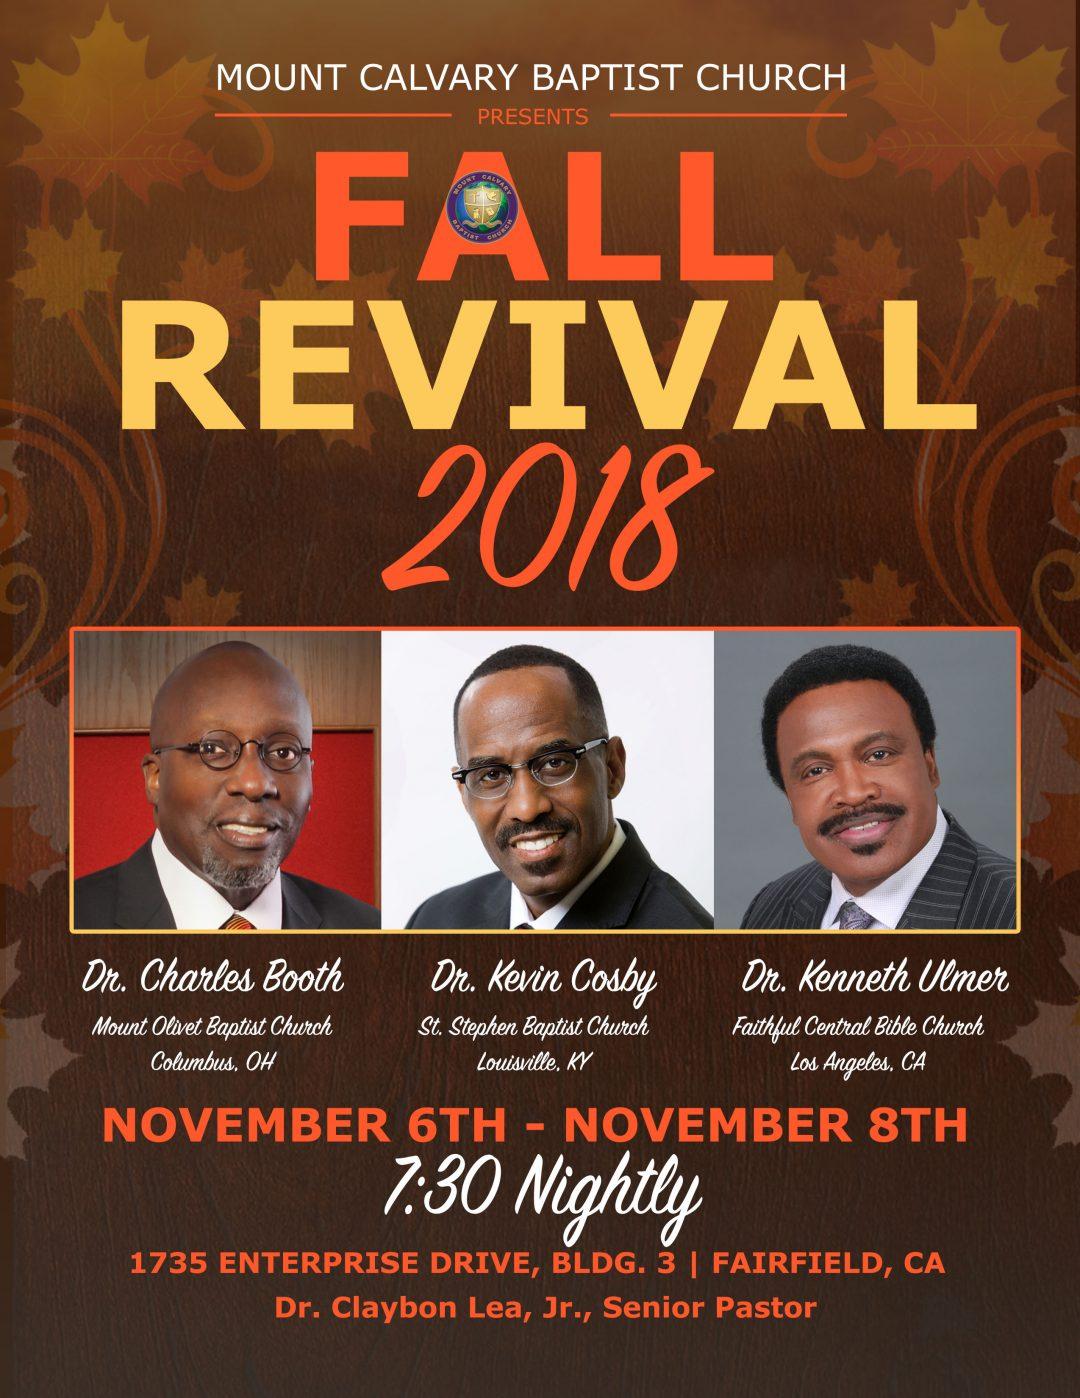 Mount Calvary Baptist Church Fall Revival 2018